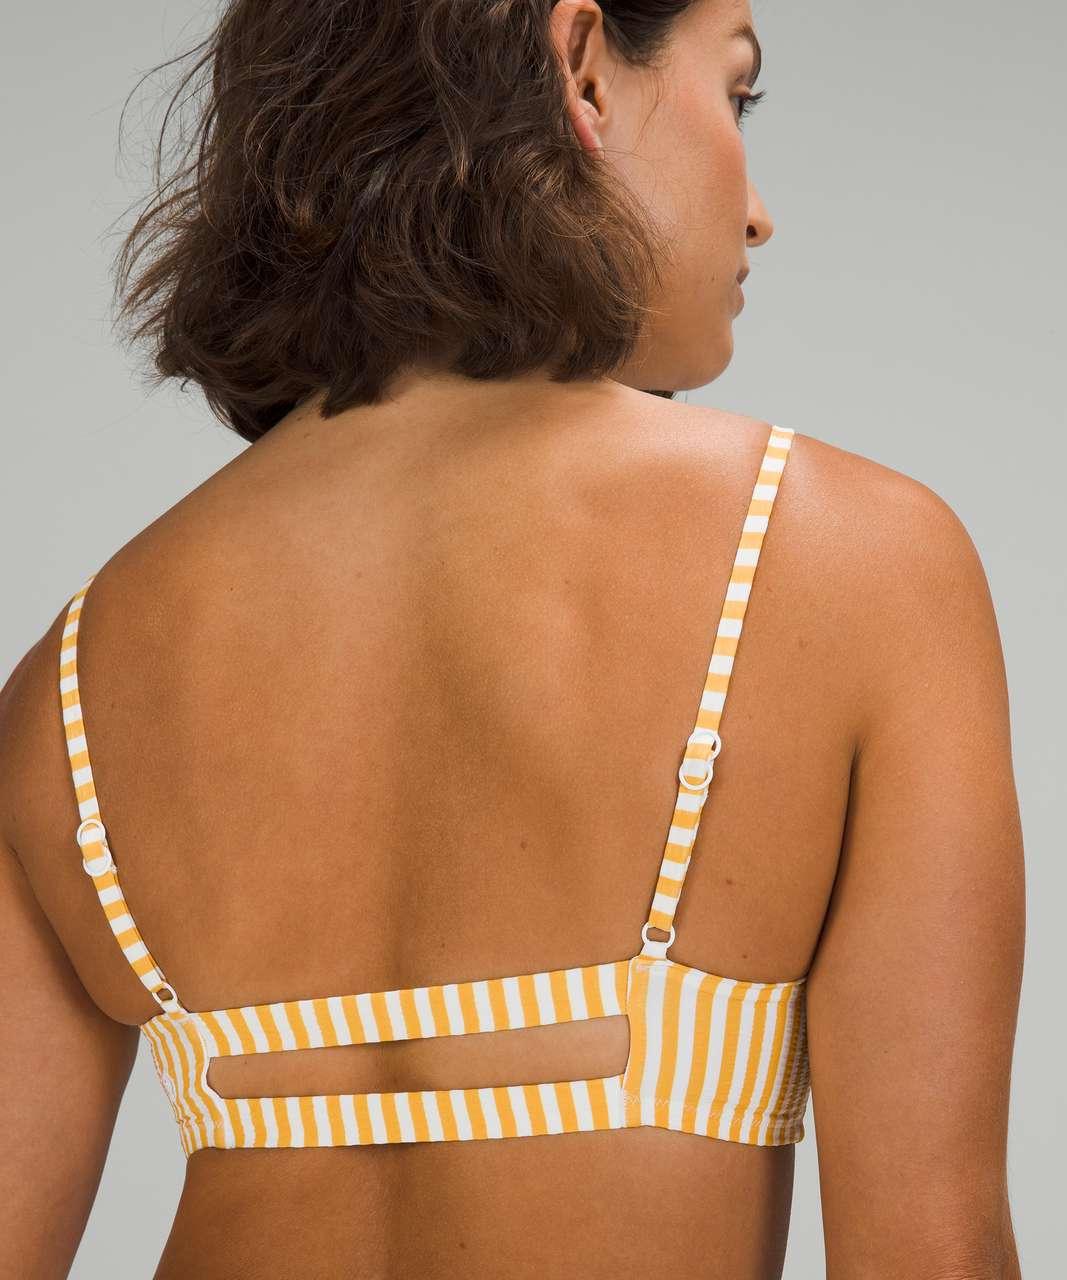 Lululemon Seersucker Swim Top *B/C Cups - Energize Stripe White Wheat Yellow